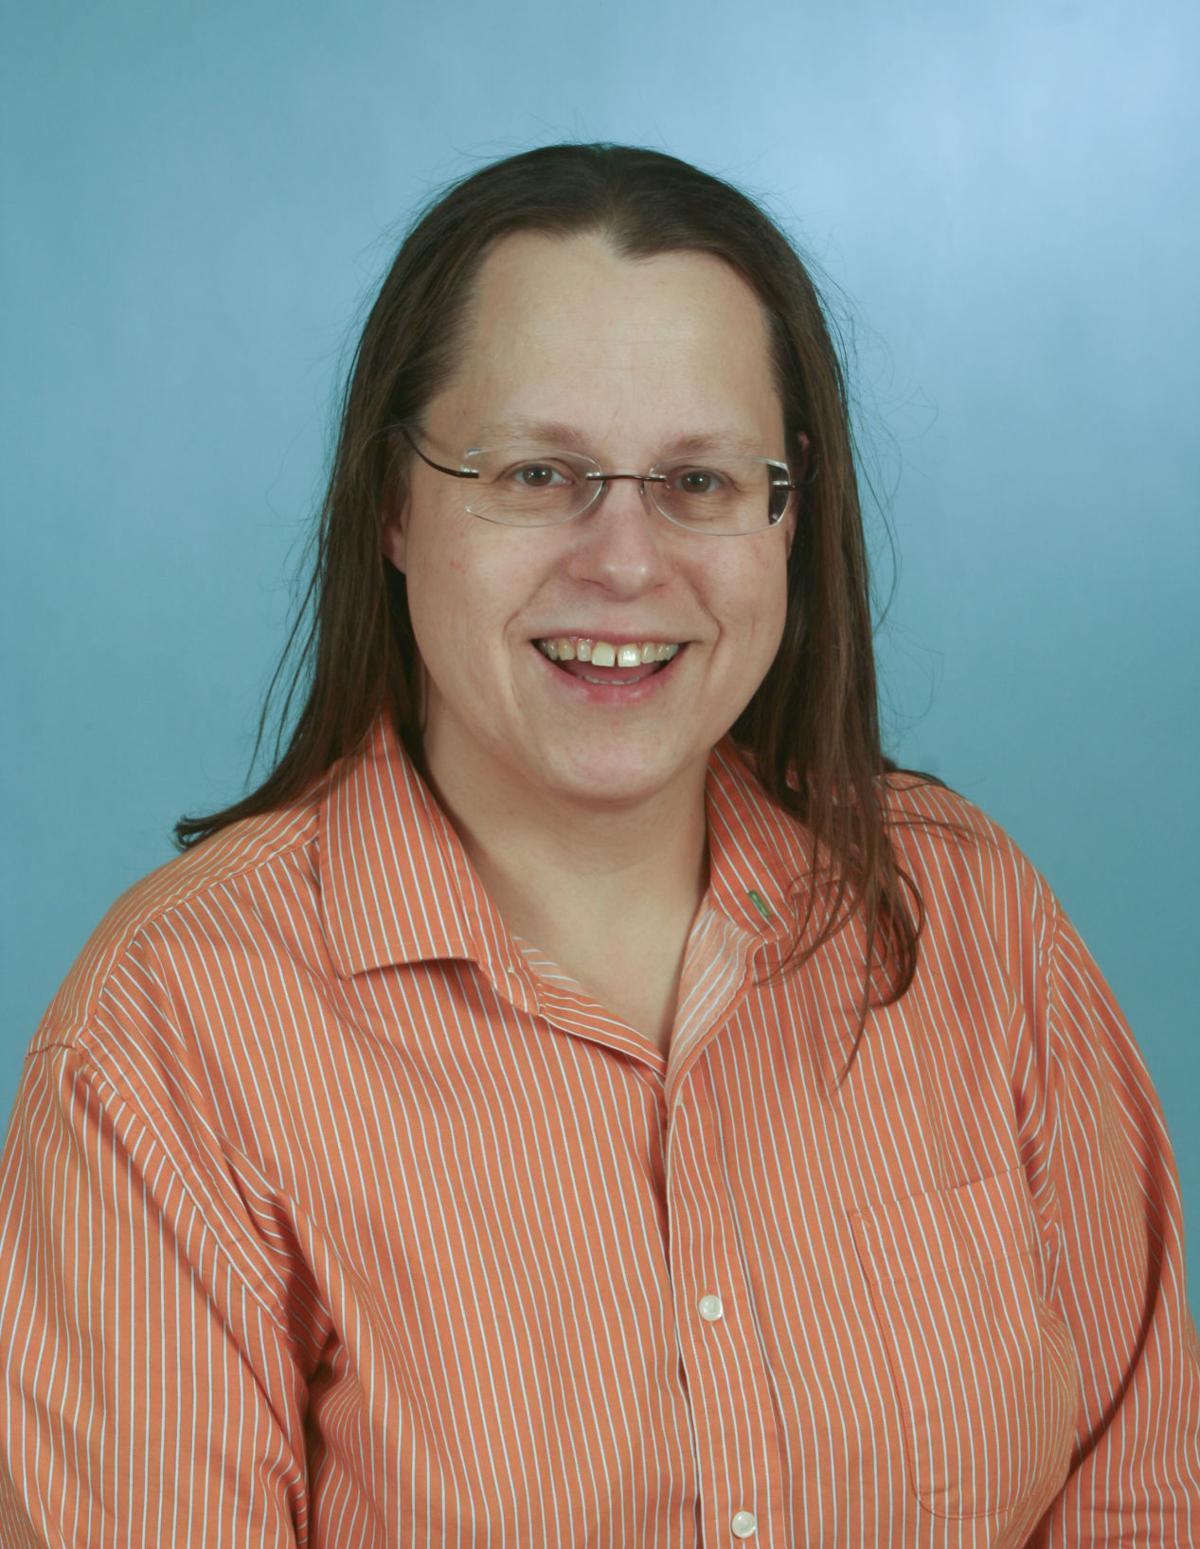 Kathryn Ottersten